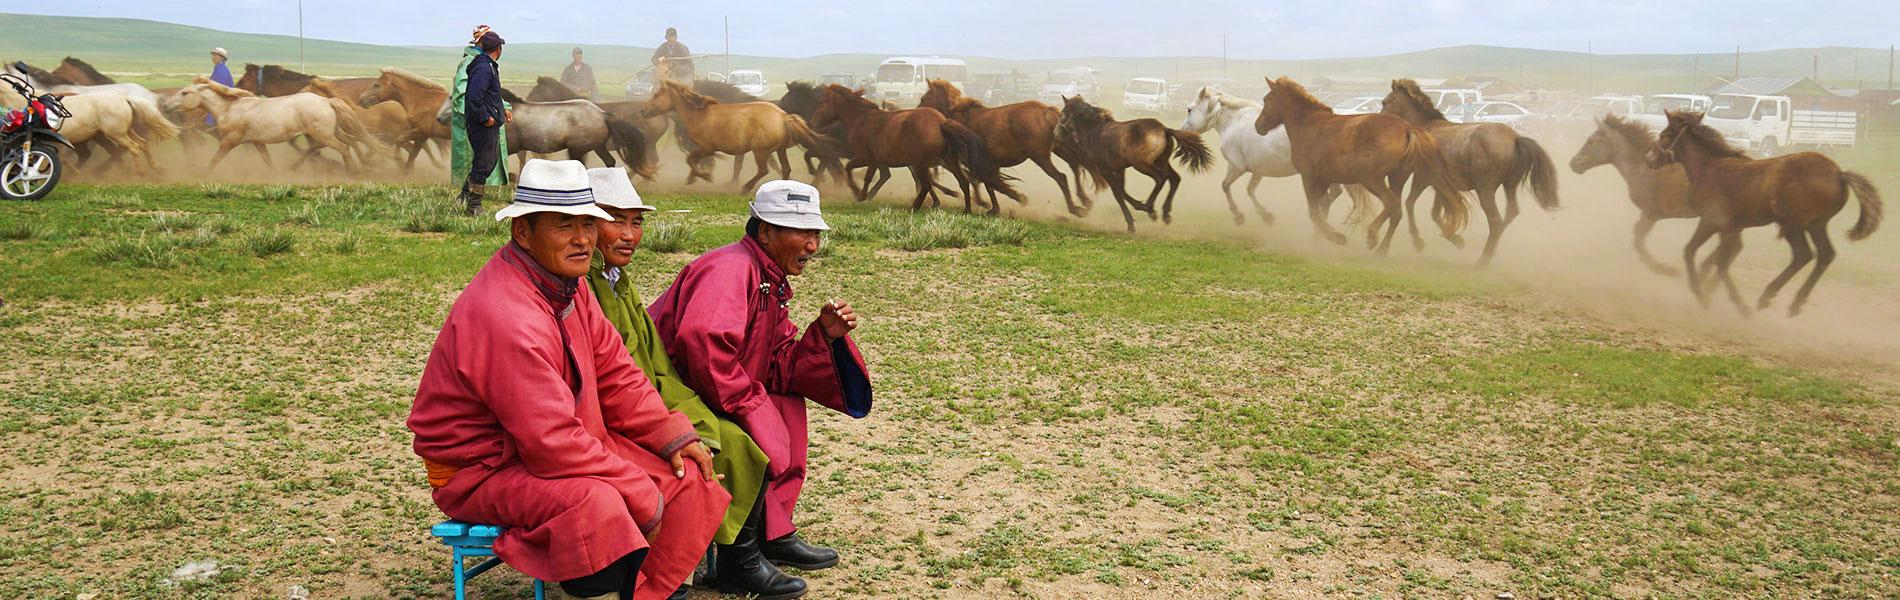 mongolia-grassland.jpg